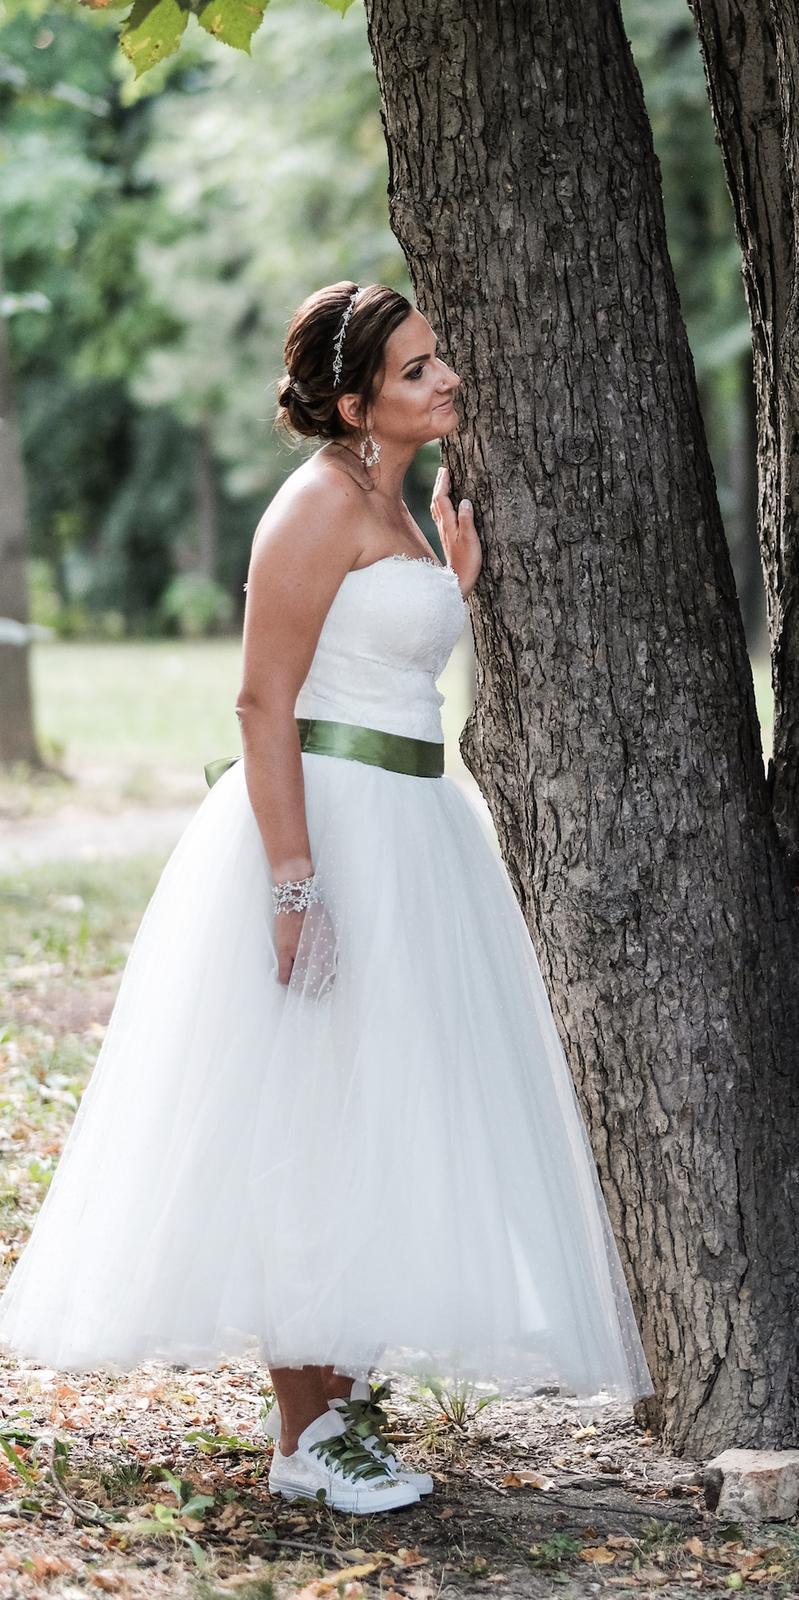 Svadobné šaty ivory s bodkami, po clenky, 36-40 - Obrázok č. 3